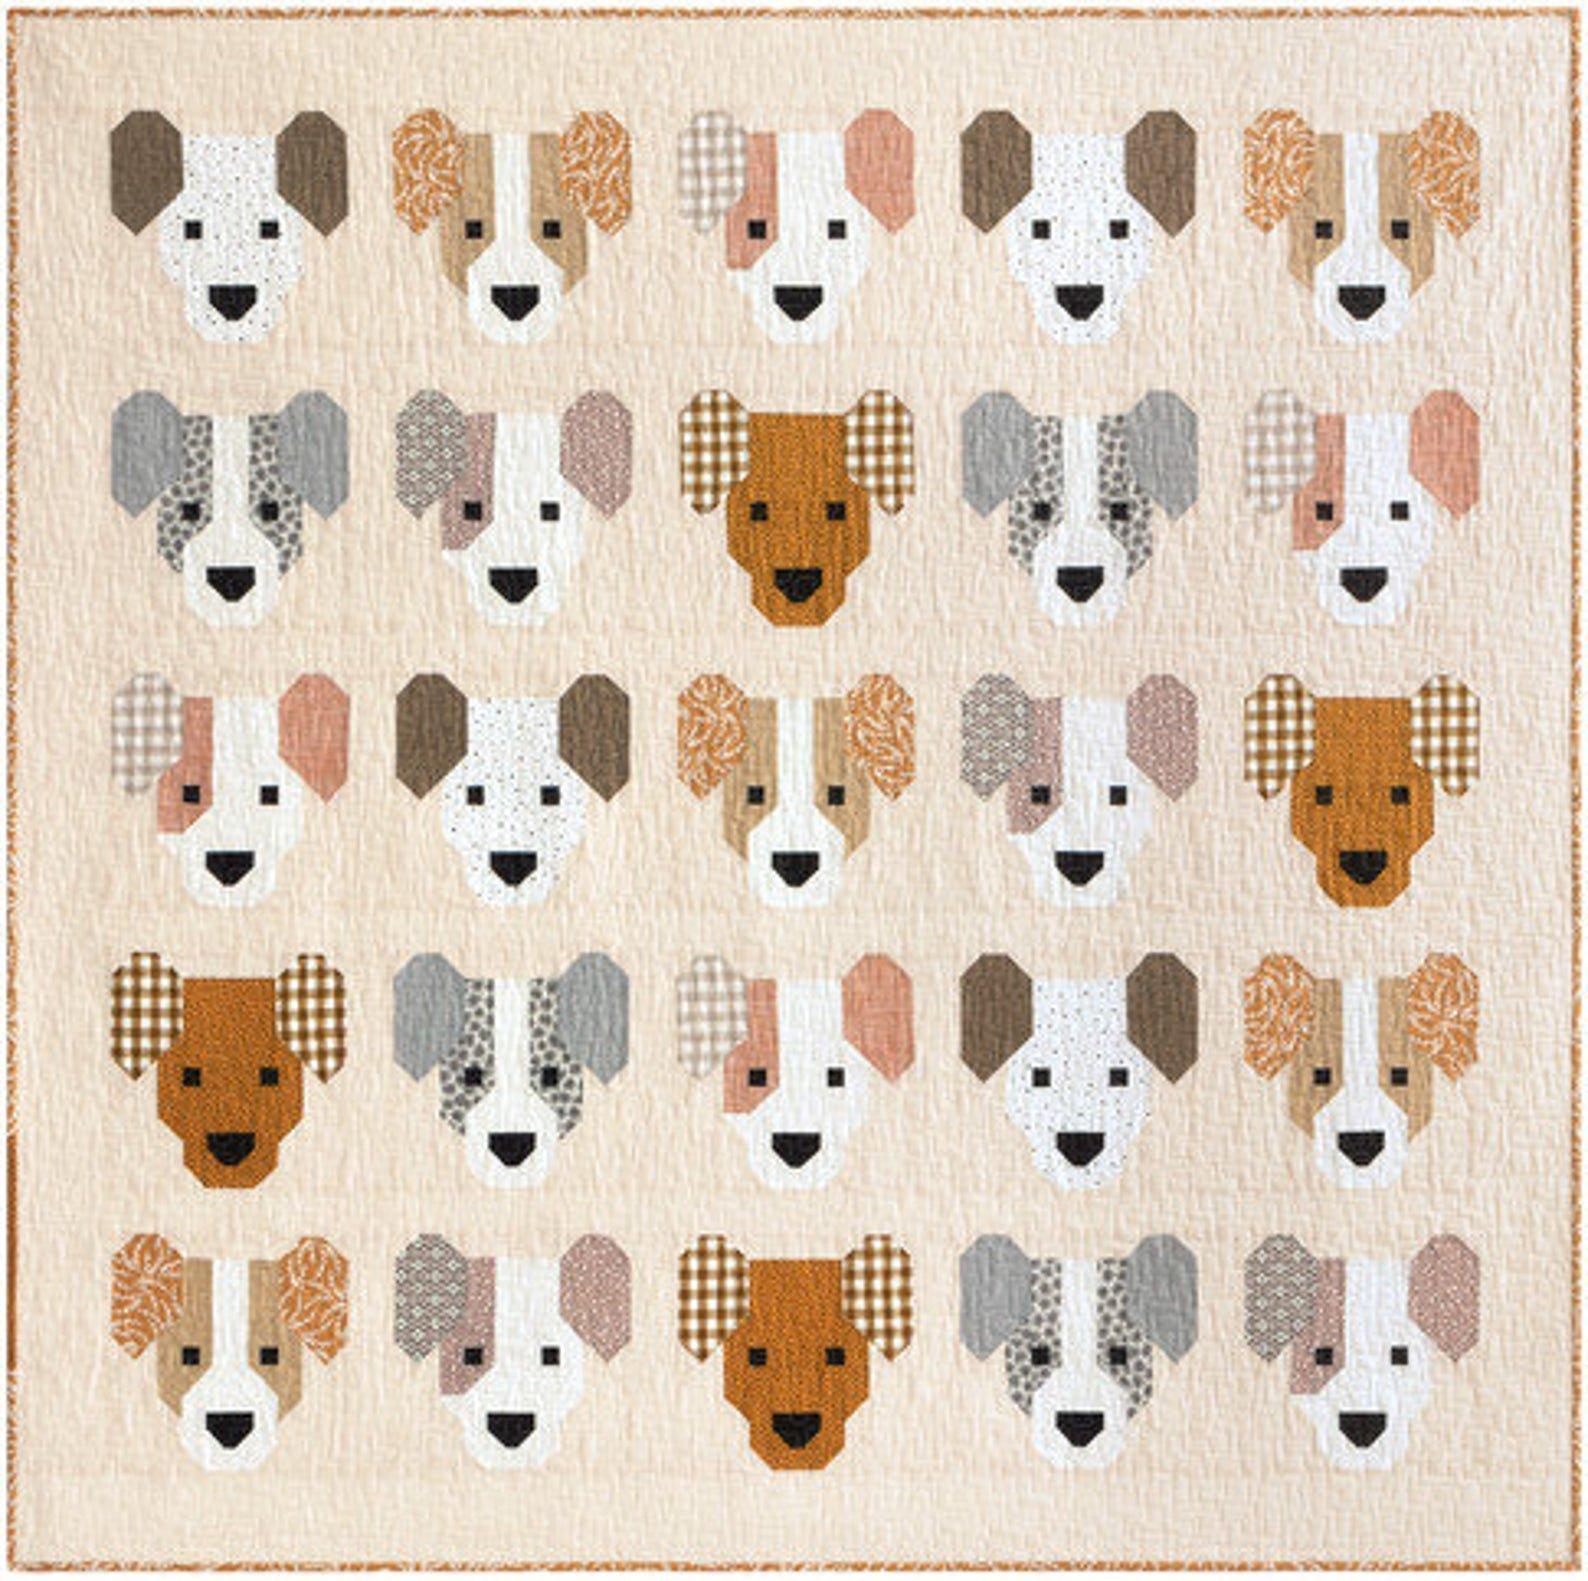 The Puppies KIT LRG 66 x 66